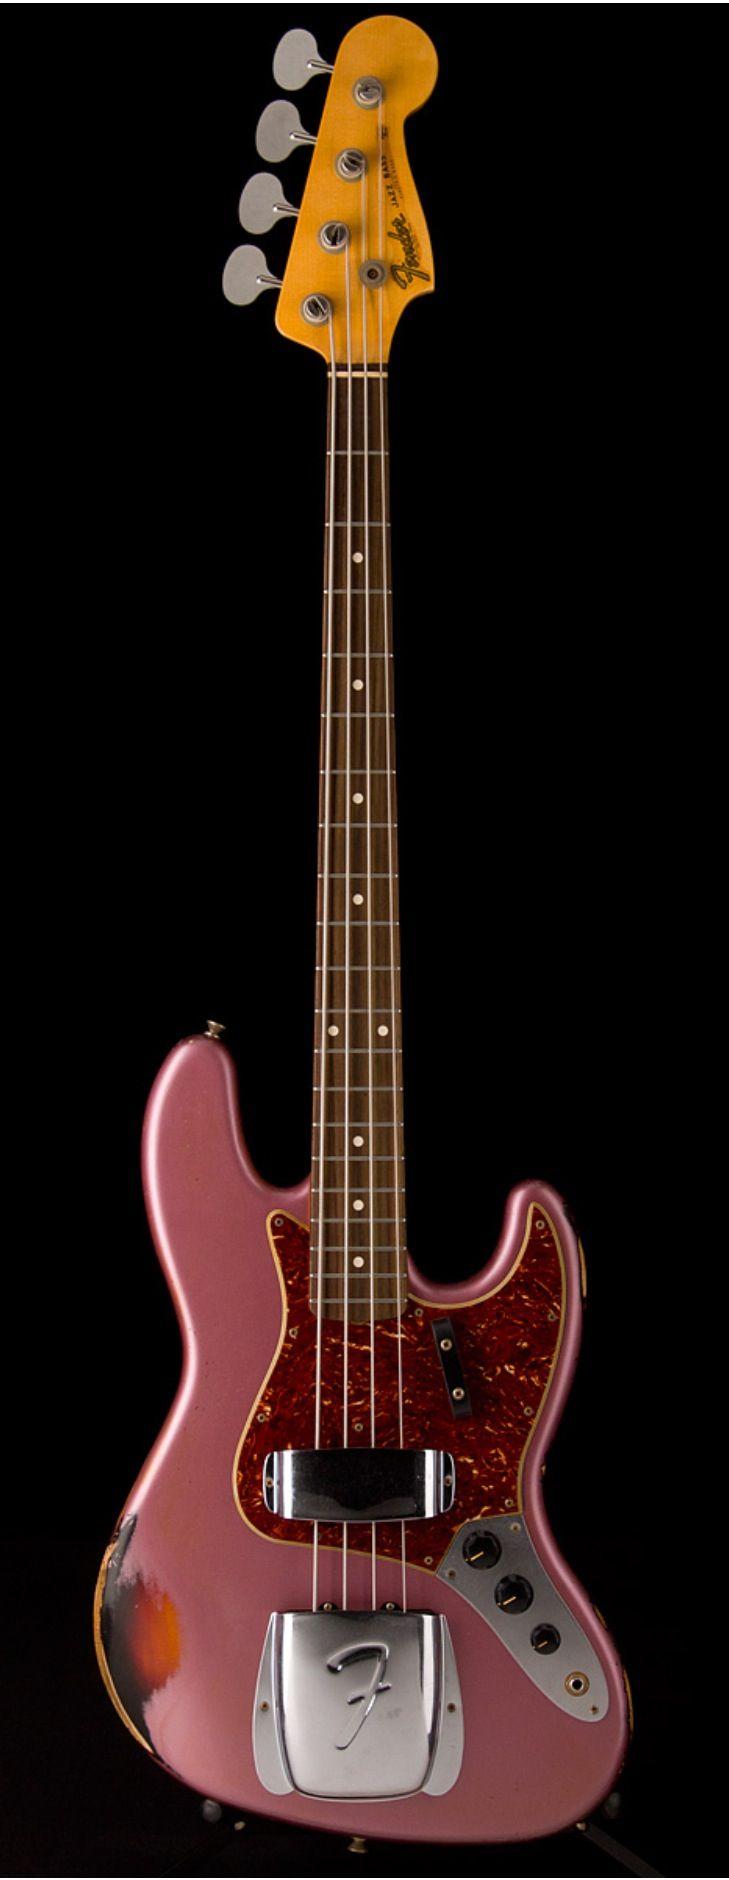 fender custom shop 1964 j bass relic burgandy mist metallic over 3 tone sunburst guitar center. Black Bedroom Furniture Sets. Home Design Ideas